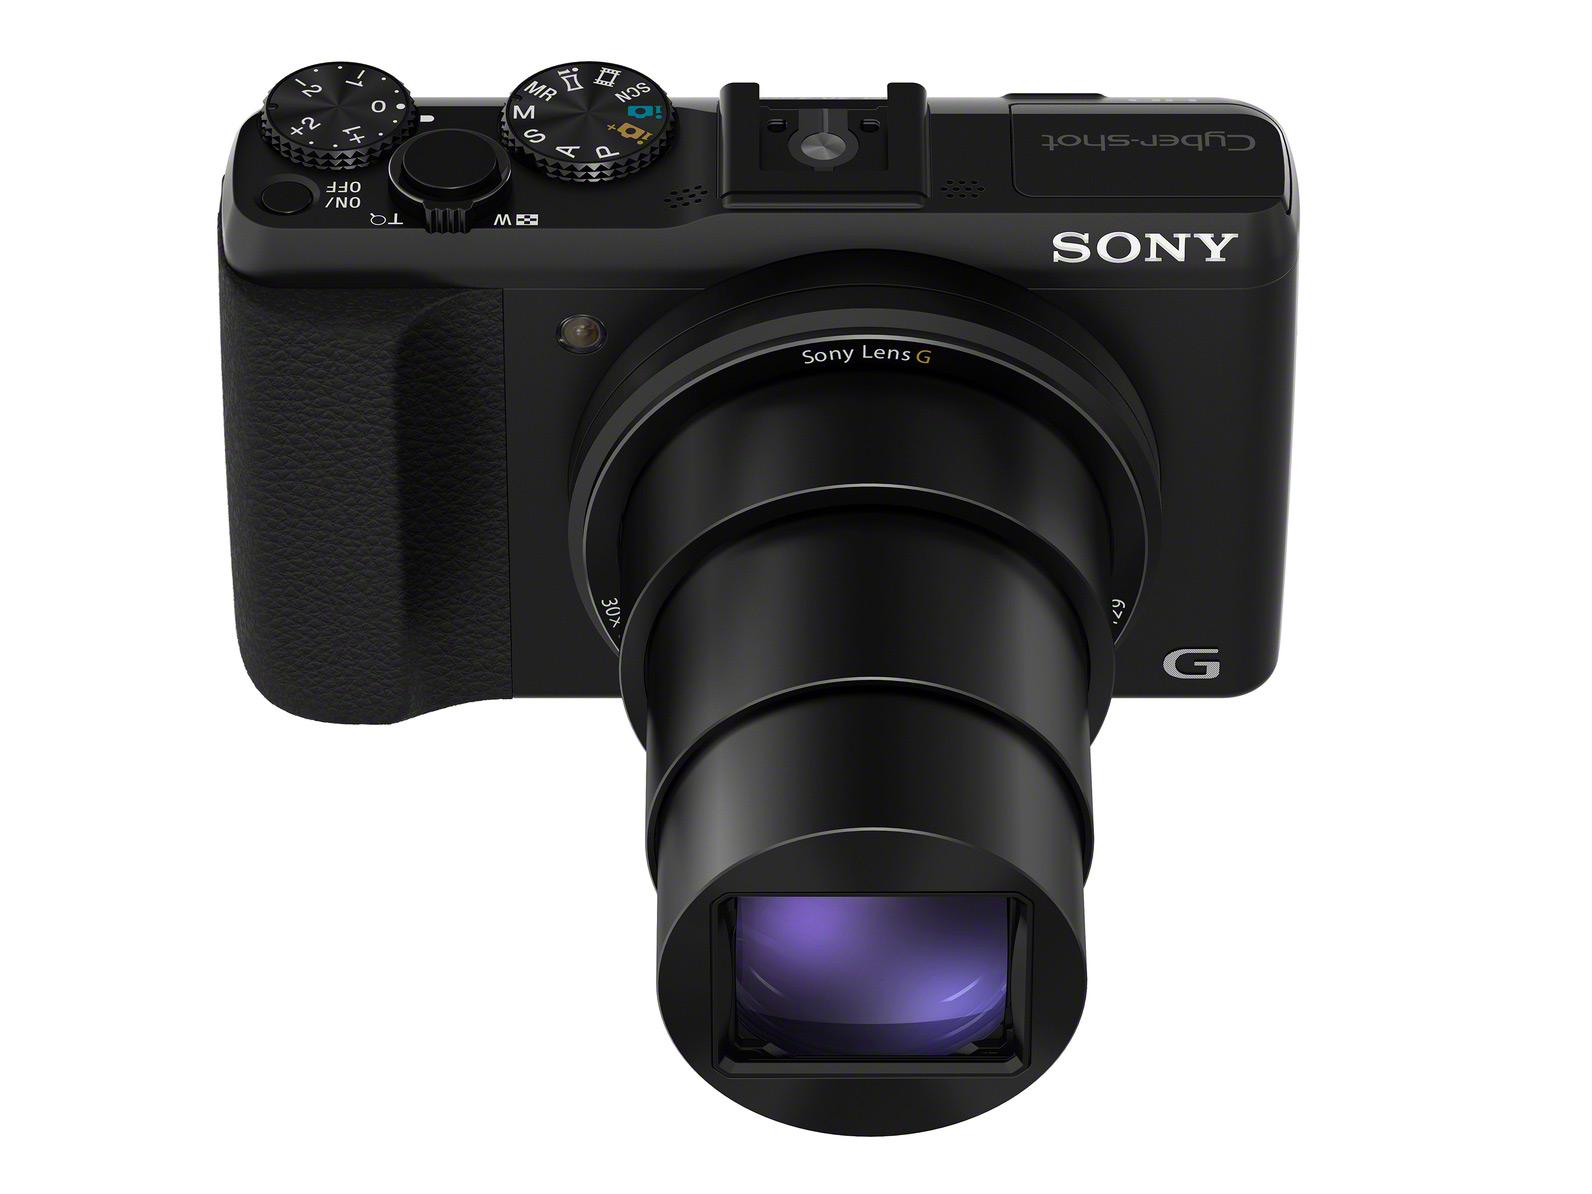 3 LCD Black Sony DSC-HX60V//B 20.4 MP Digital Camera with 30x Optical Image Stabilized Zoom